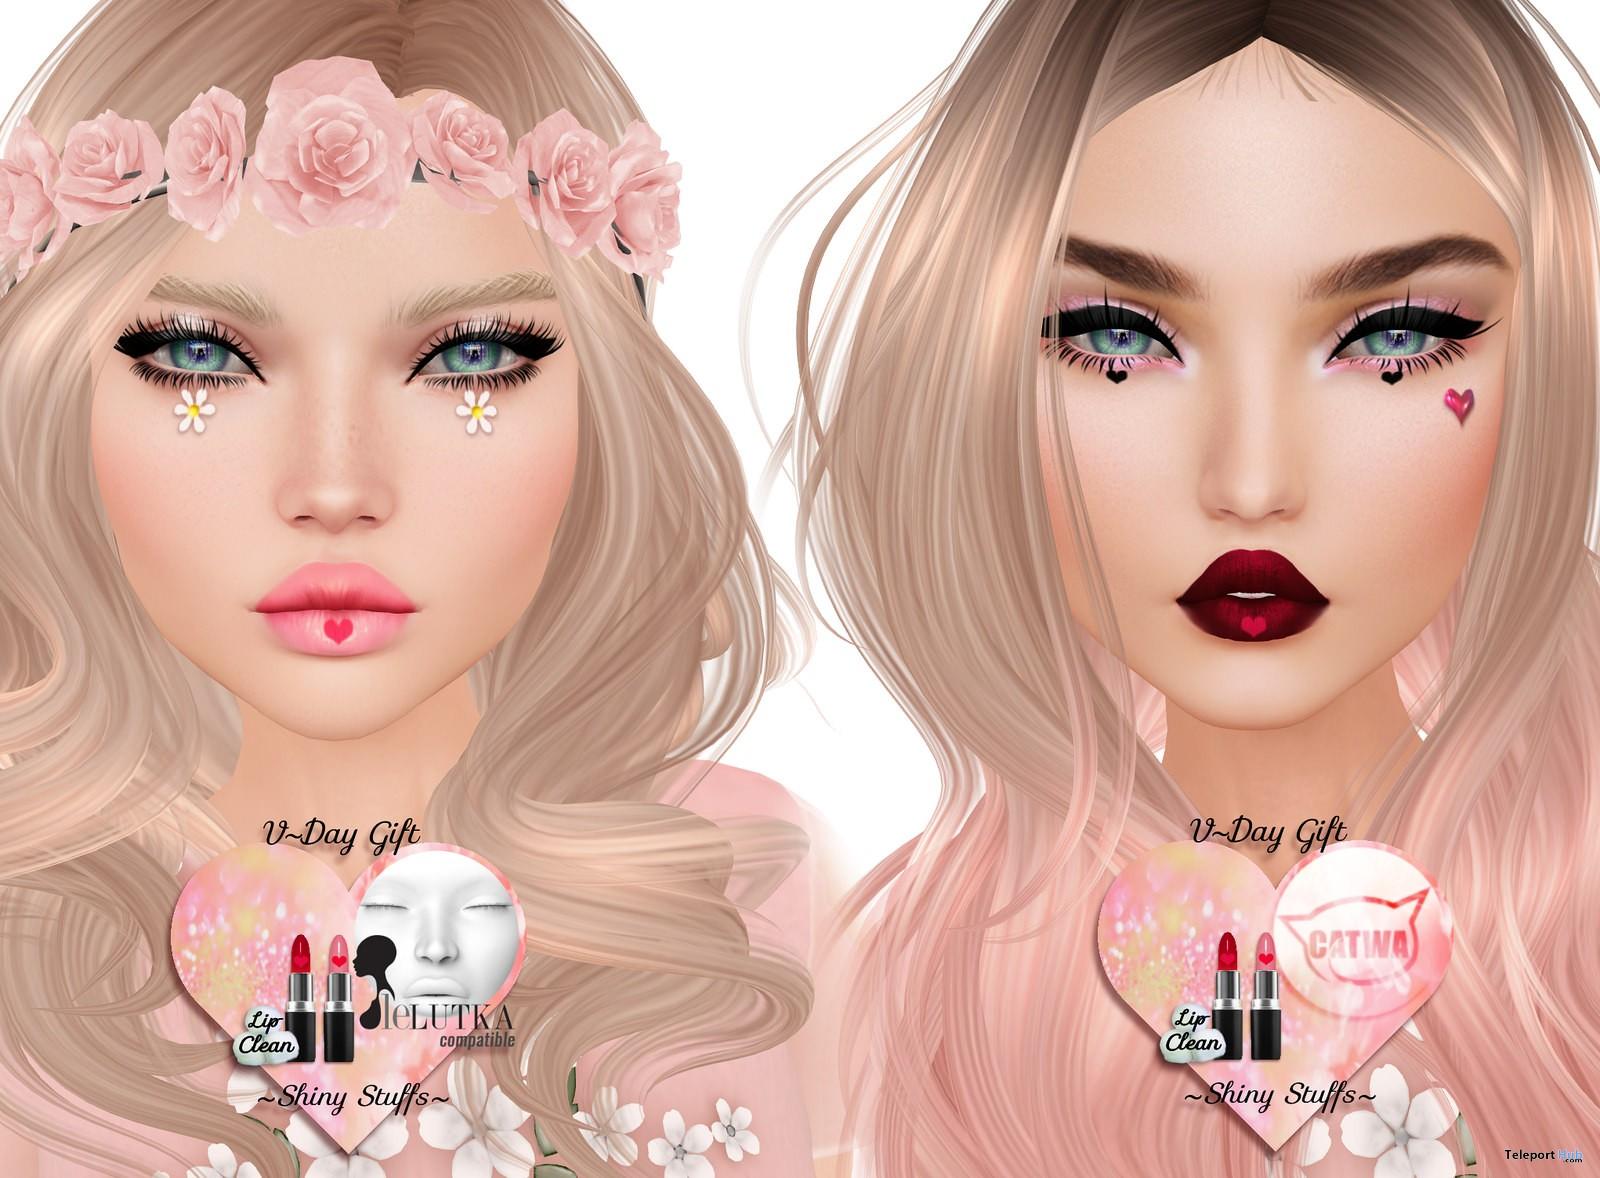 Lip Appliers 2 Colors Valentine 2017 Gift by Shiny Stuffs - Teleport Hub - teleporthub.com